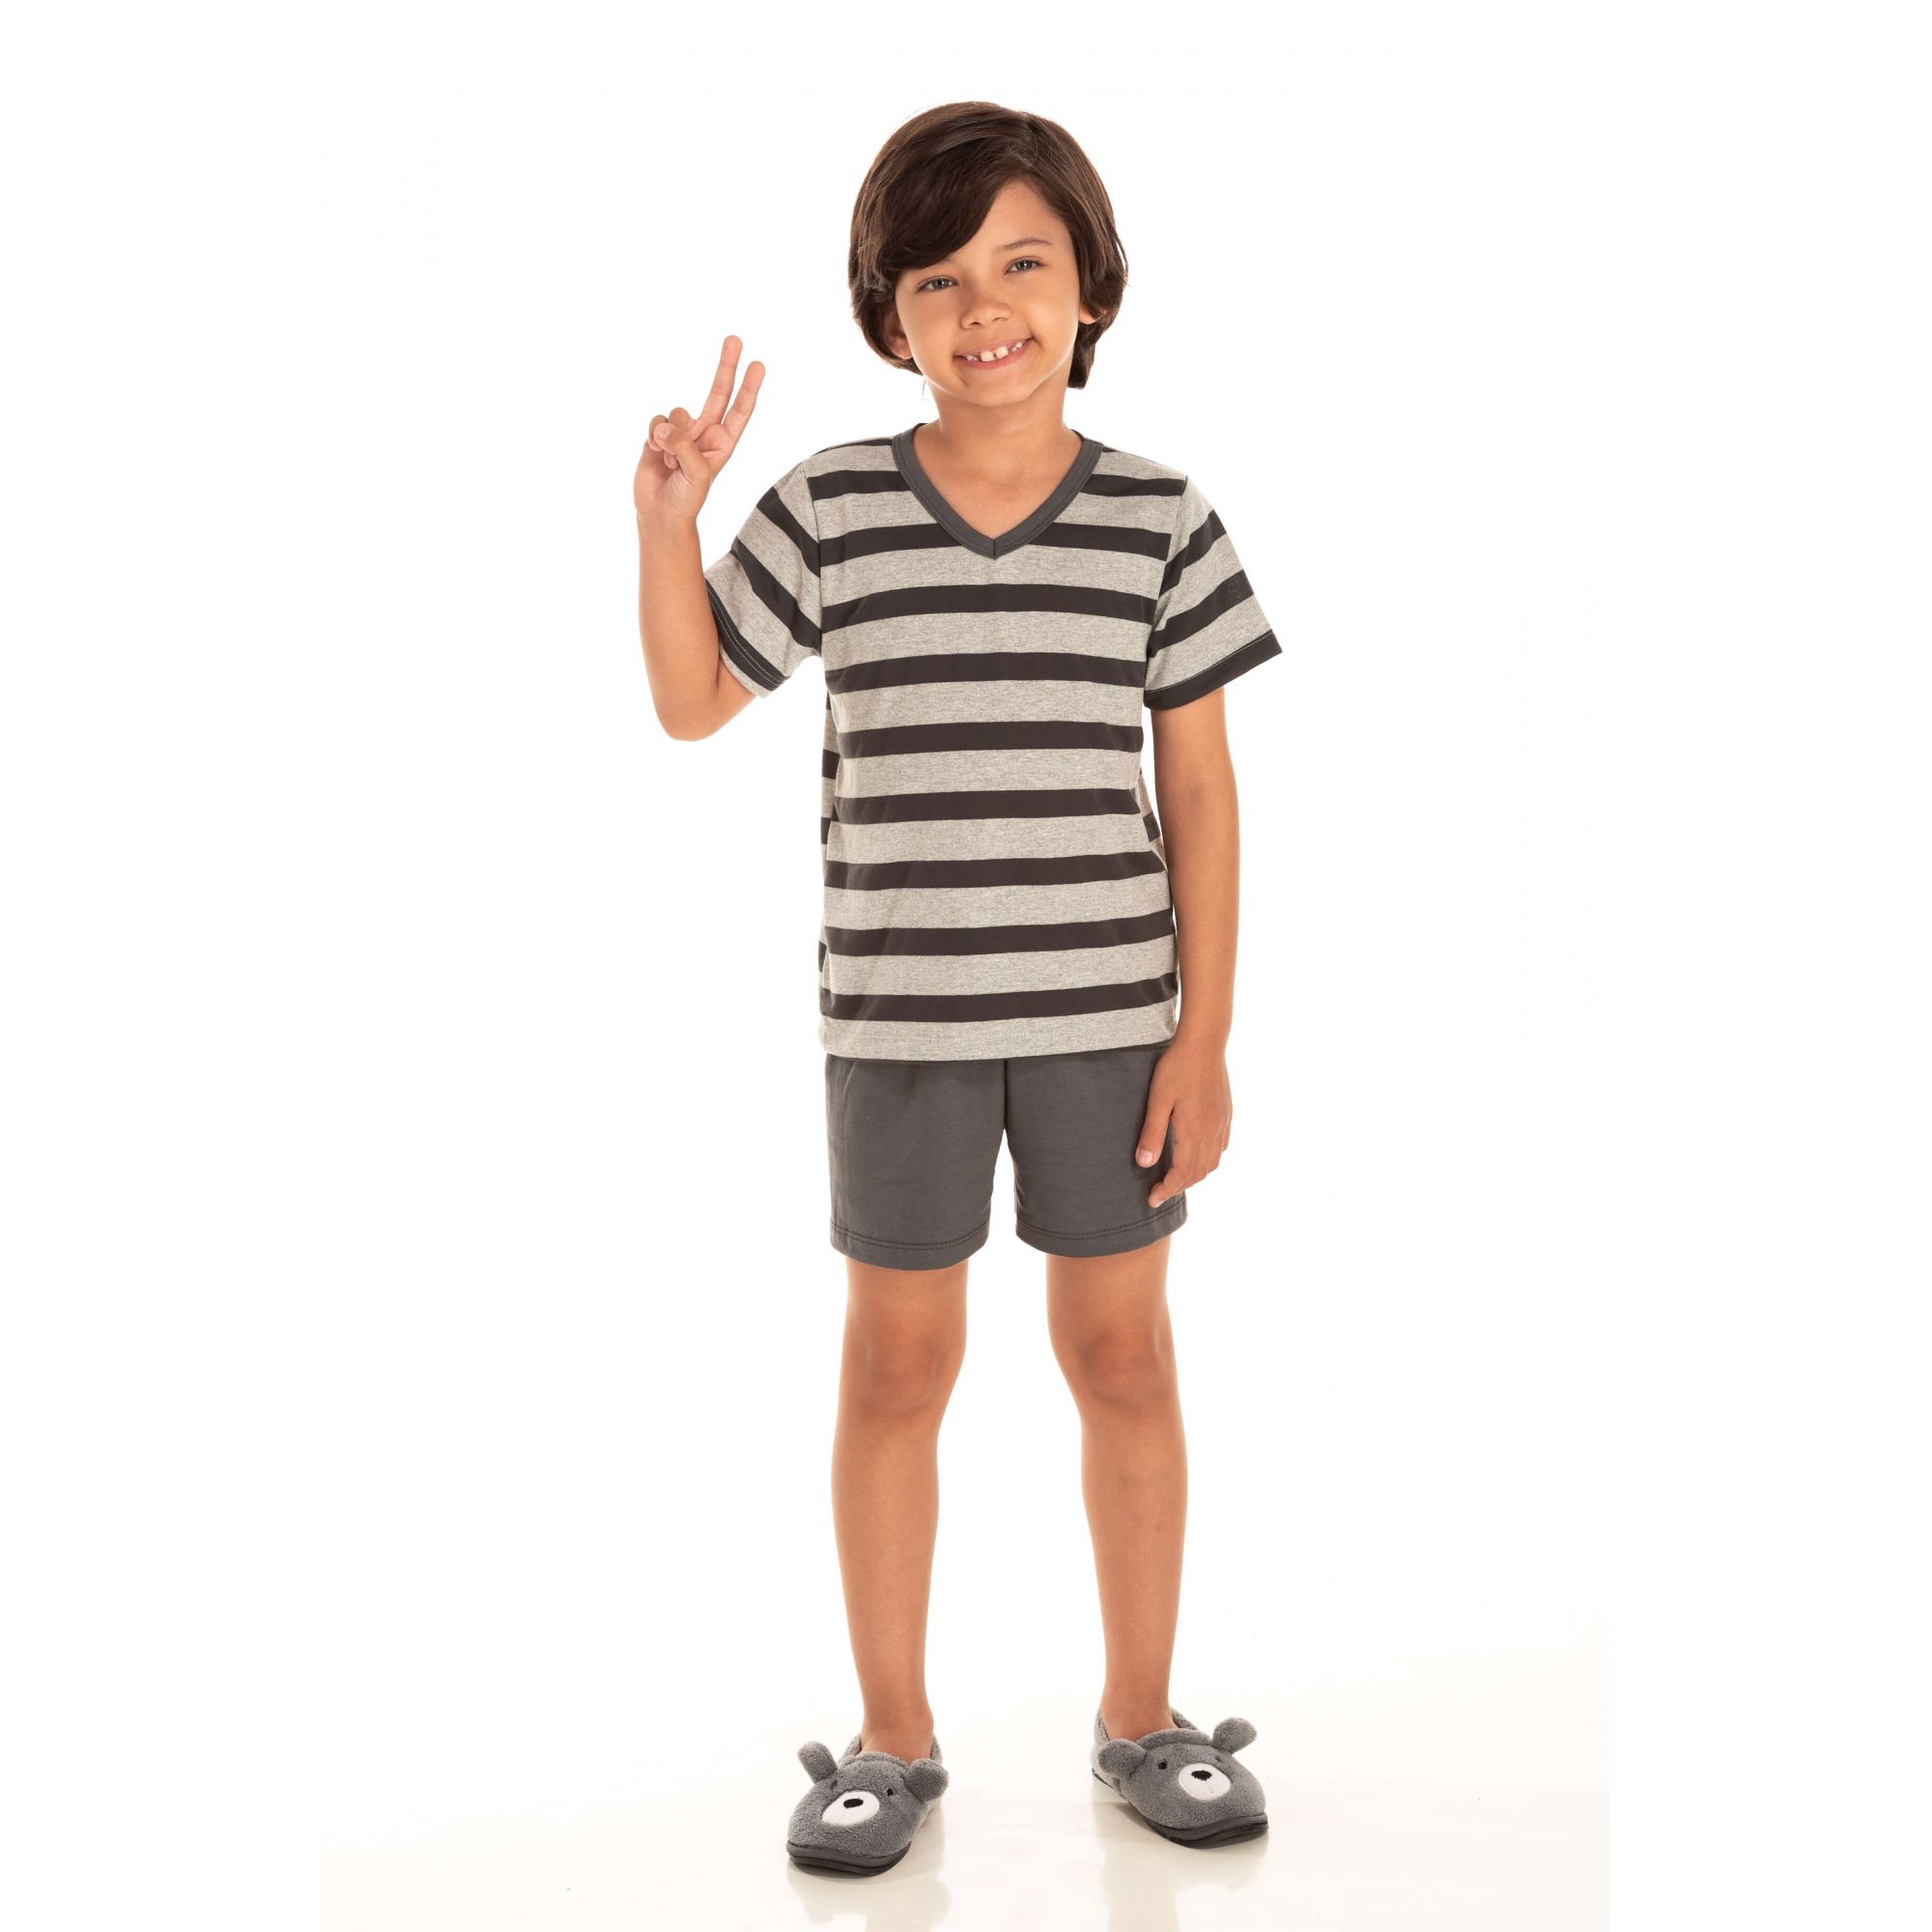 102/C - Pijama Infantil Curto - Pai e Filho